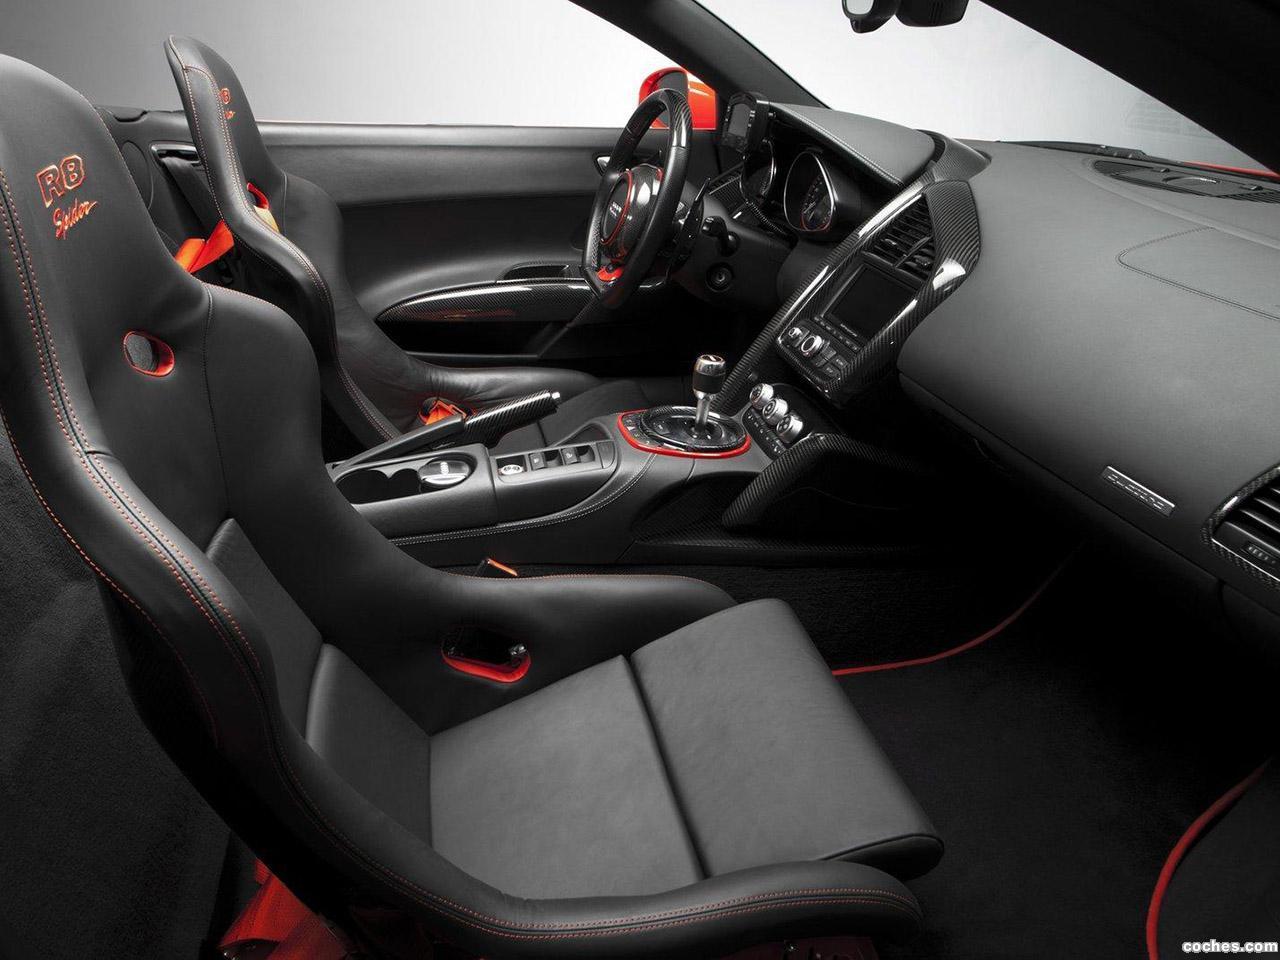 Foto 2 de Audi R8 Spyder V10 RENM RMS 2011